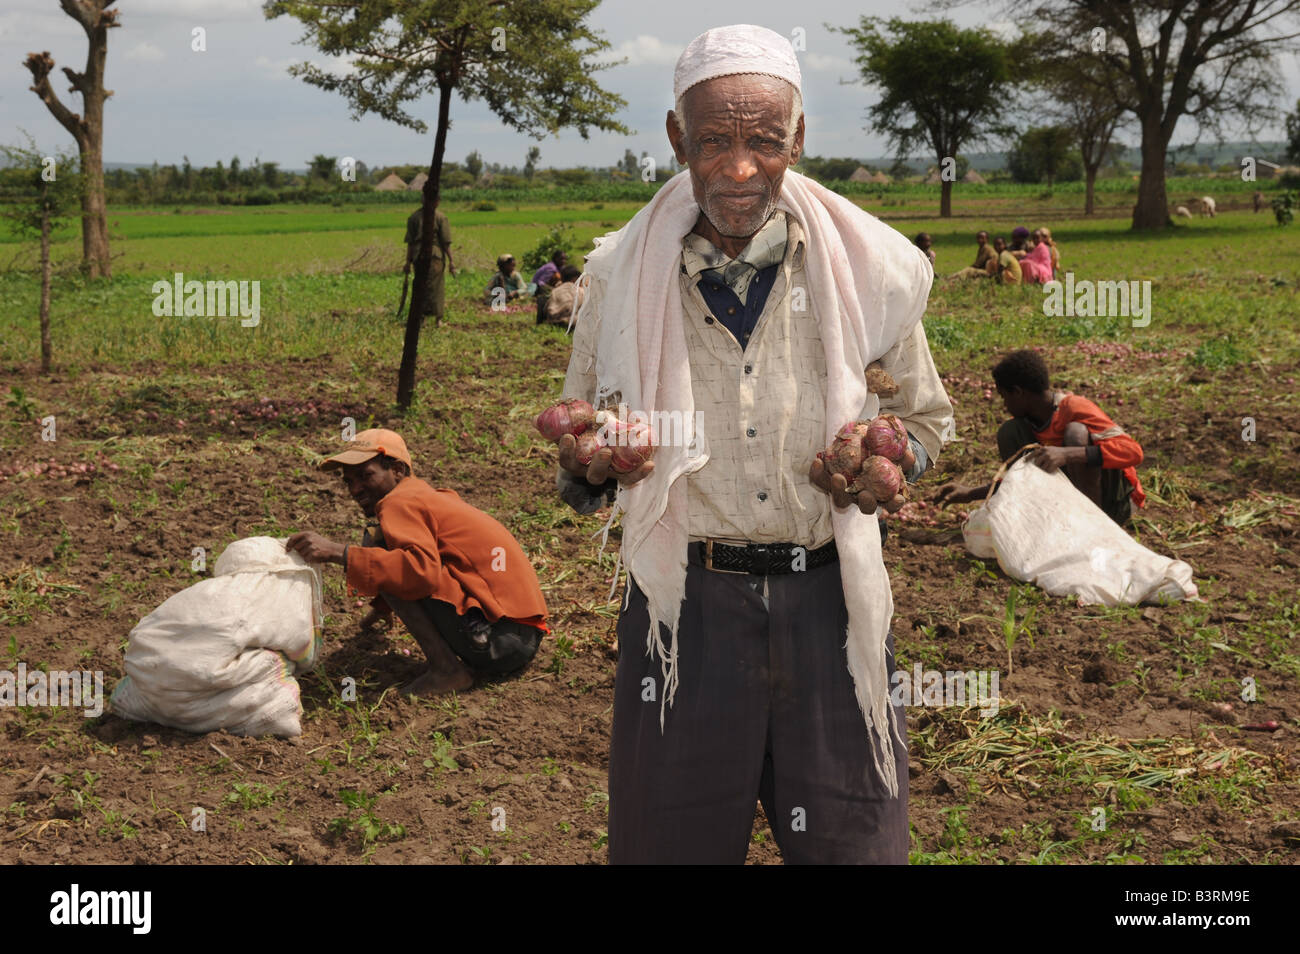 Farmer Sunir Sushreta with his oinion crop in Mareko Woreda Southern Ethiopia - Stock Image